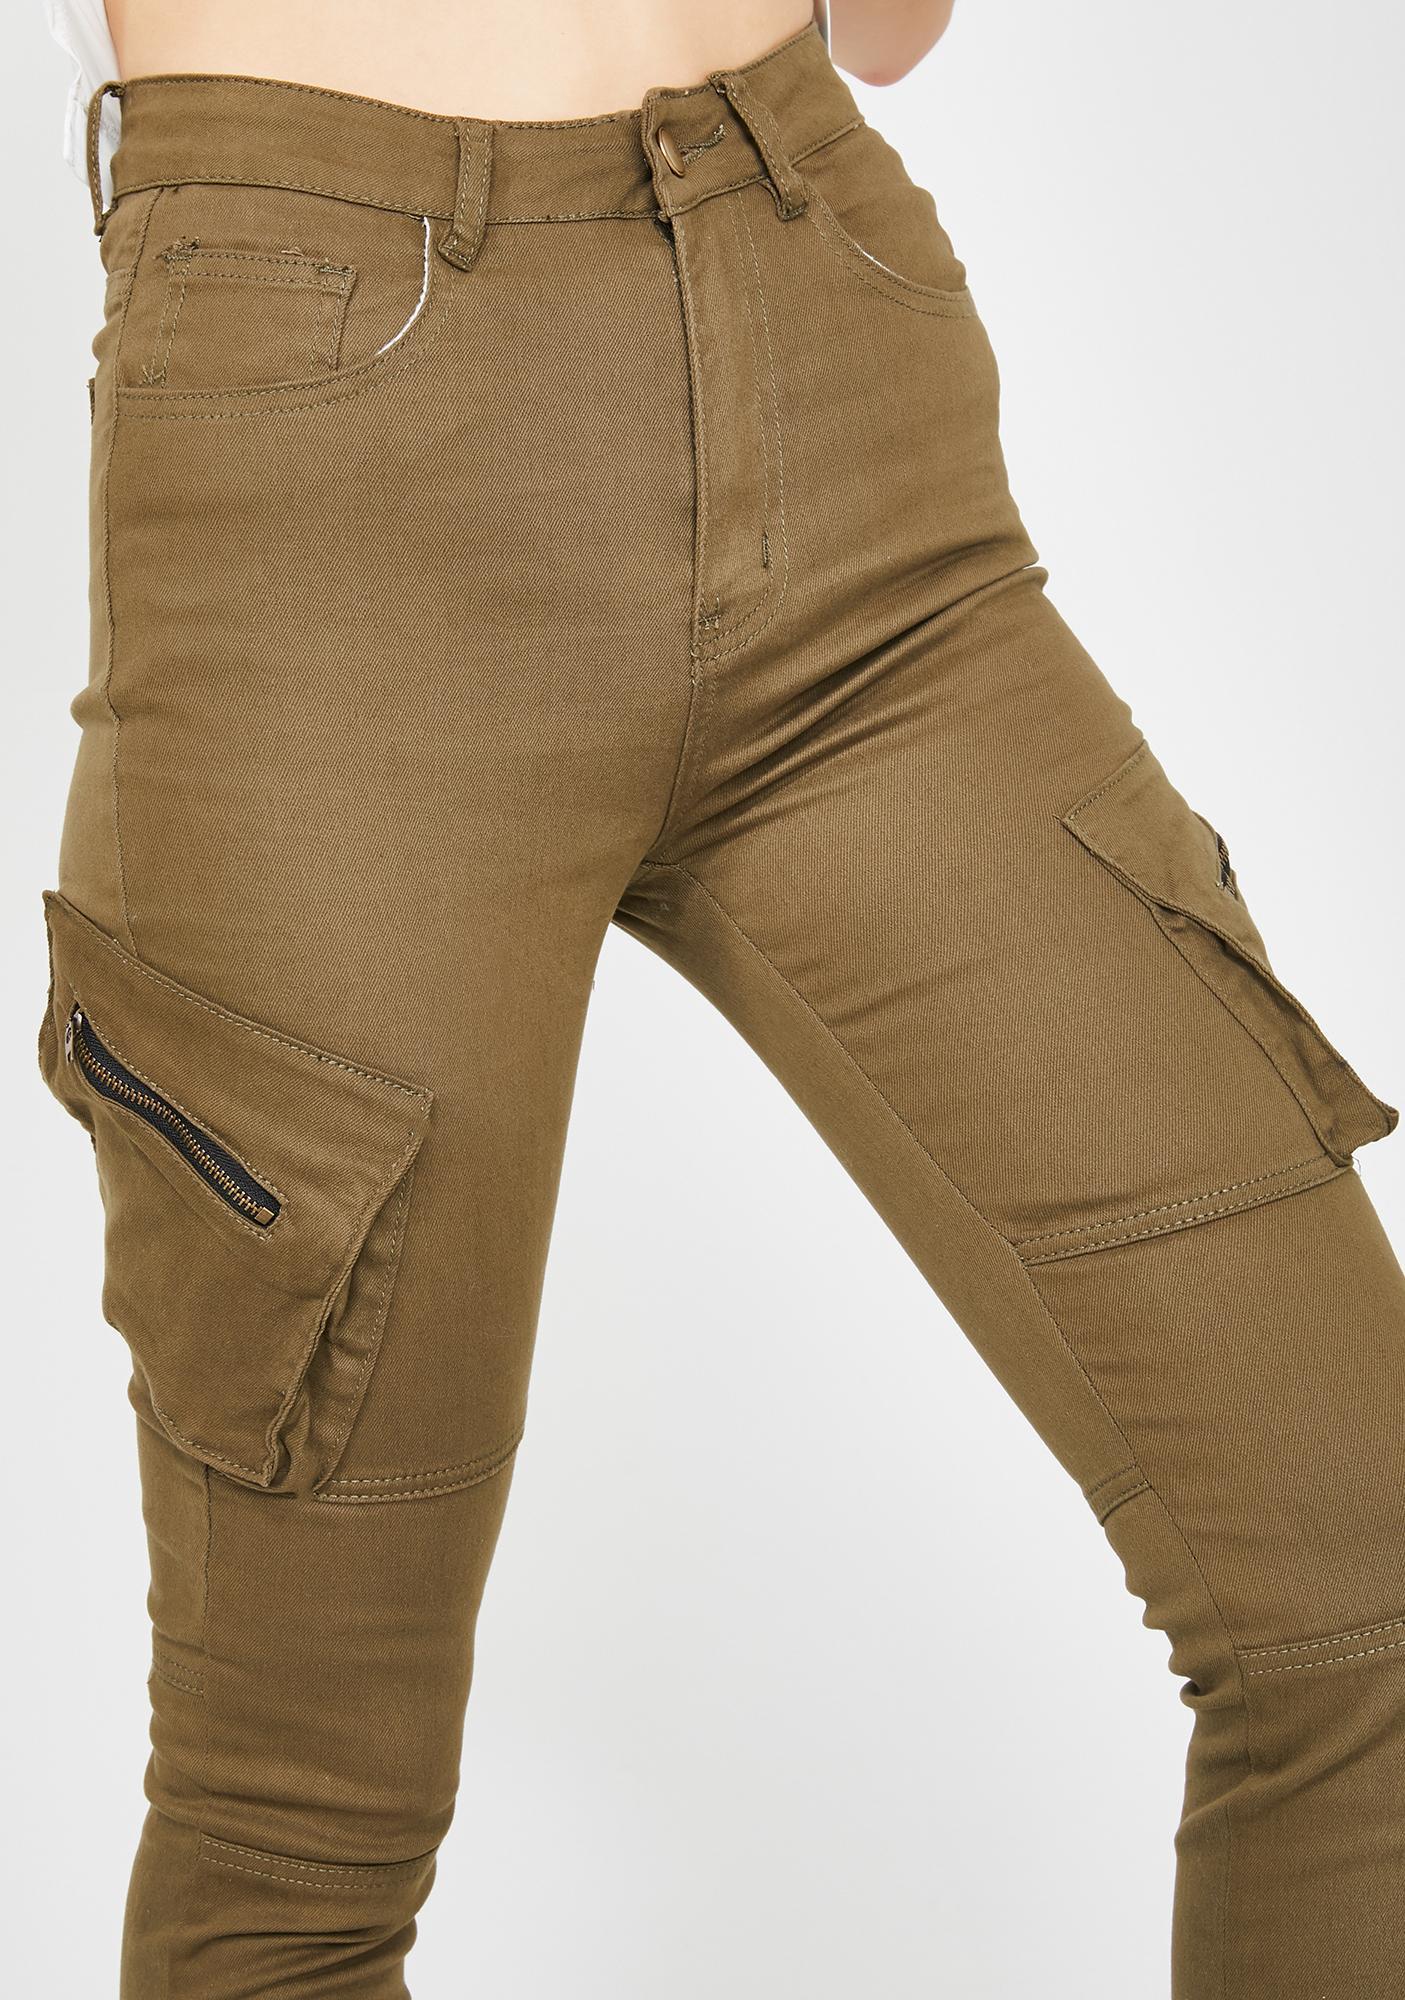 Toxic Turmoil Cargo Pants